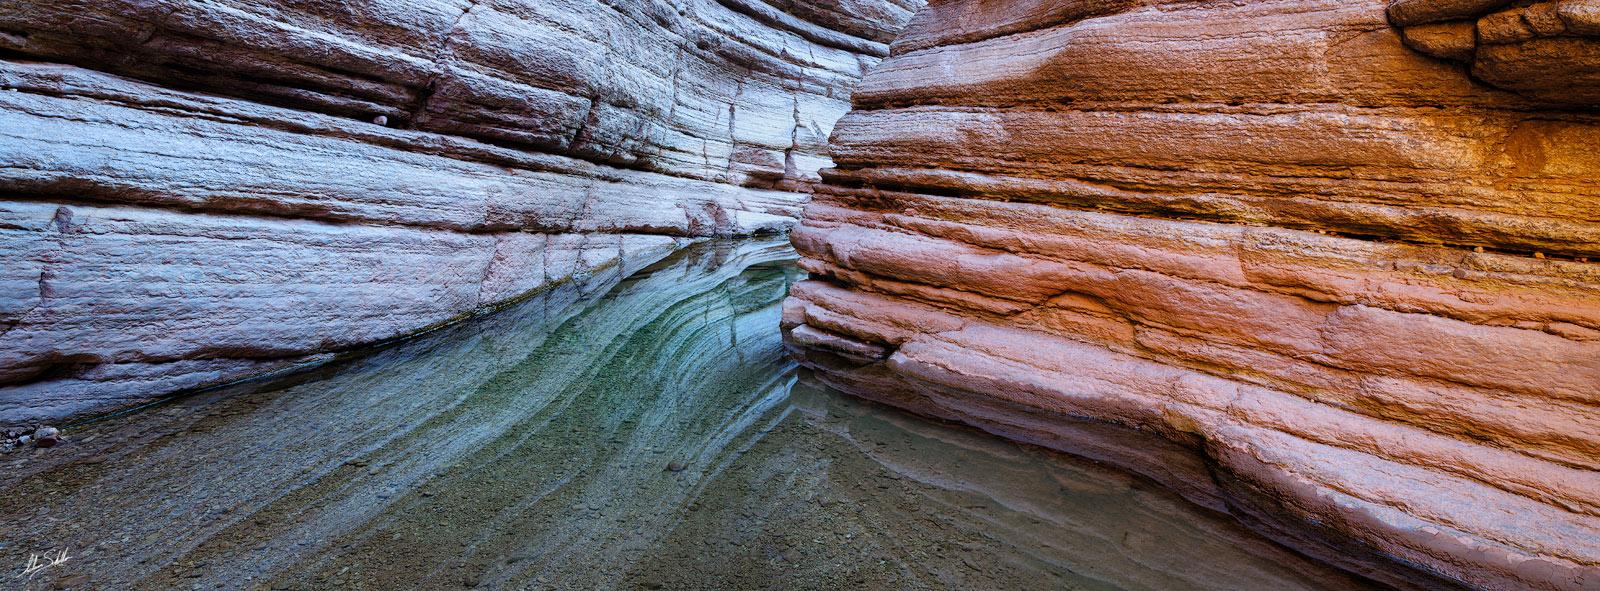 AZ, Arizona, Expedition, FujiFilm, GFX, GFX 100, Grand Canyon, Matkat, Matkatamiba, National Park, Reflection, River Trip, photo